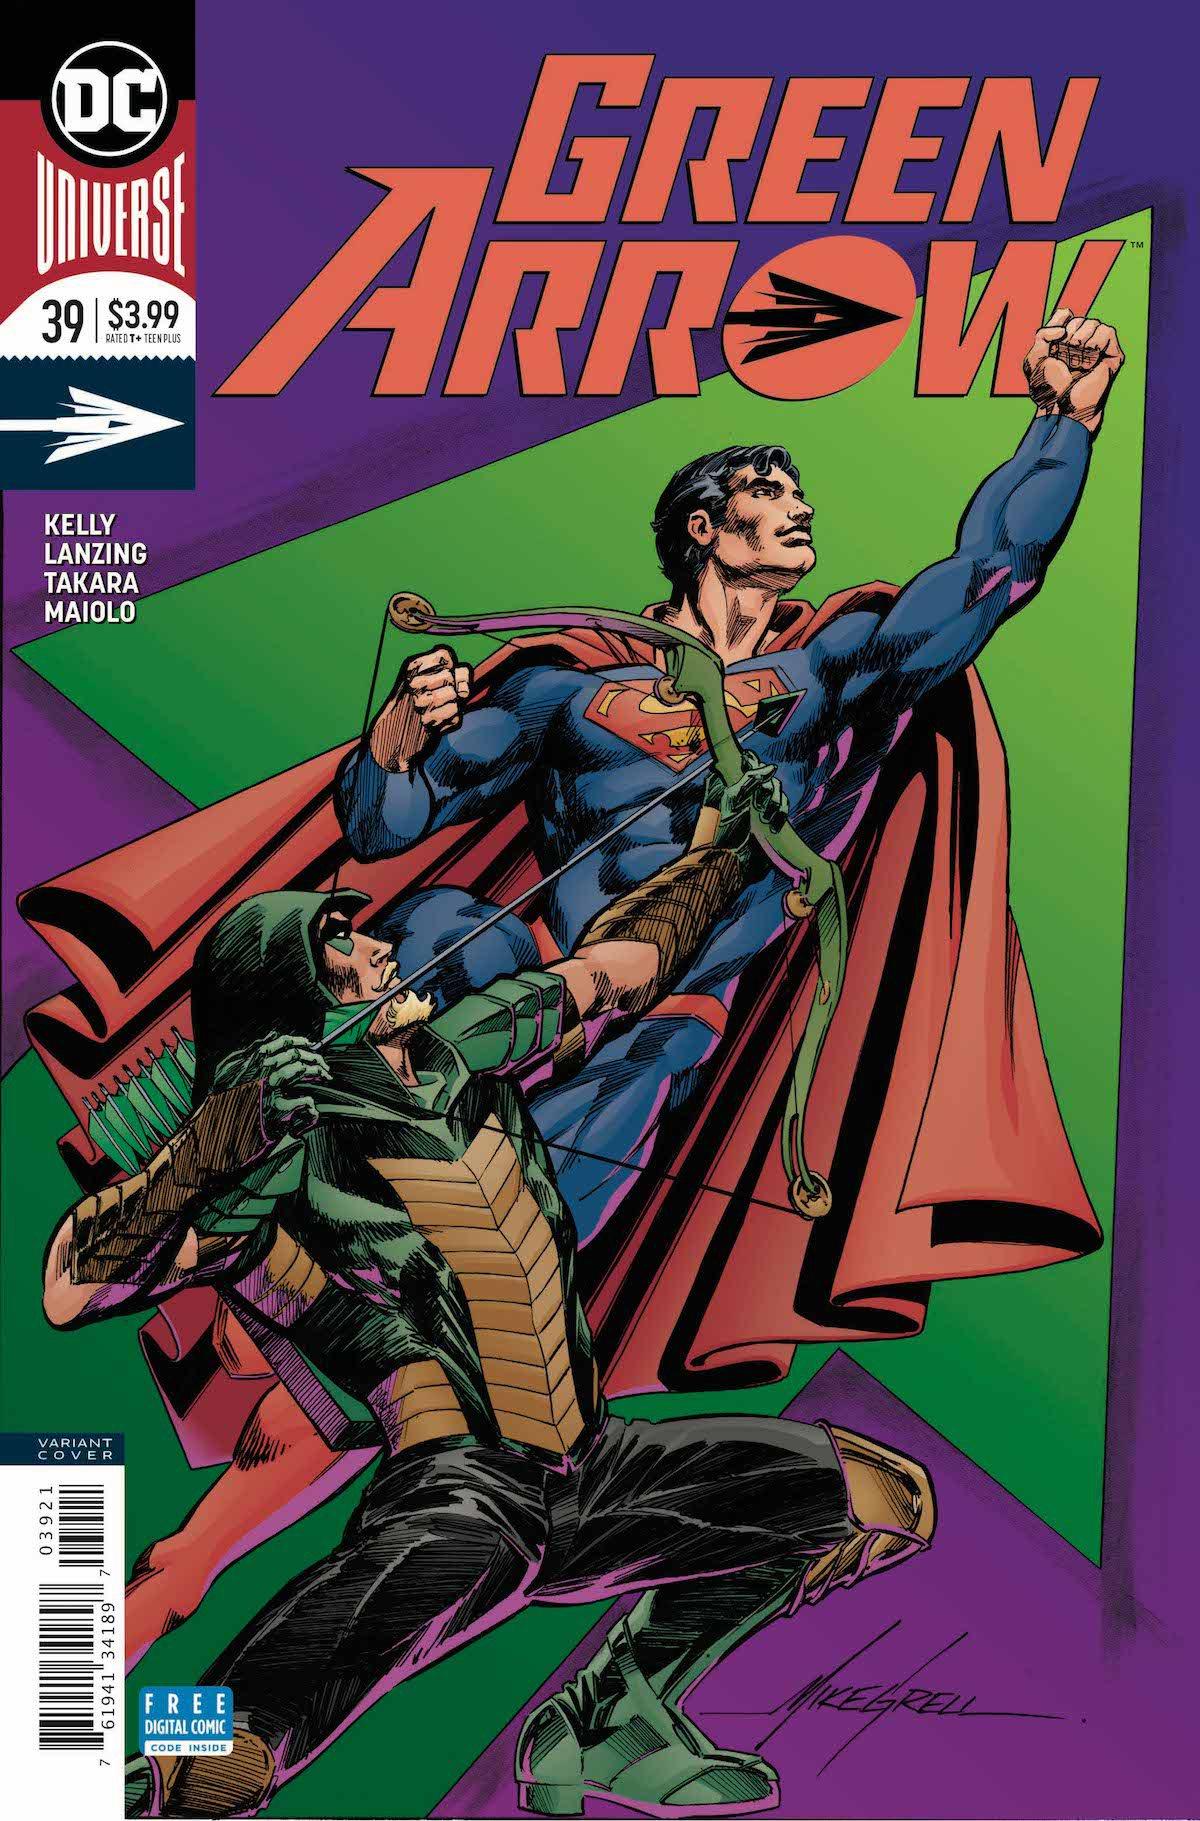 Green Arrow #39 variant cover